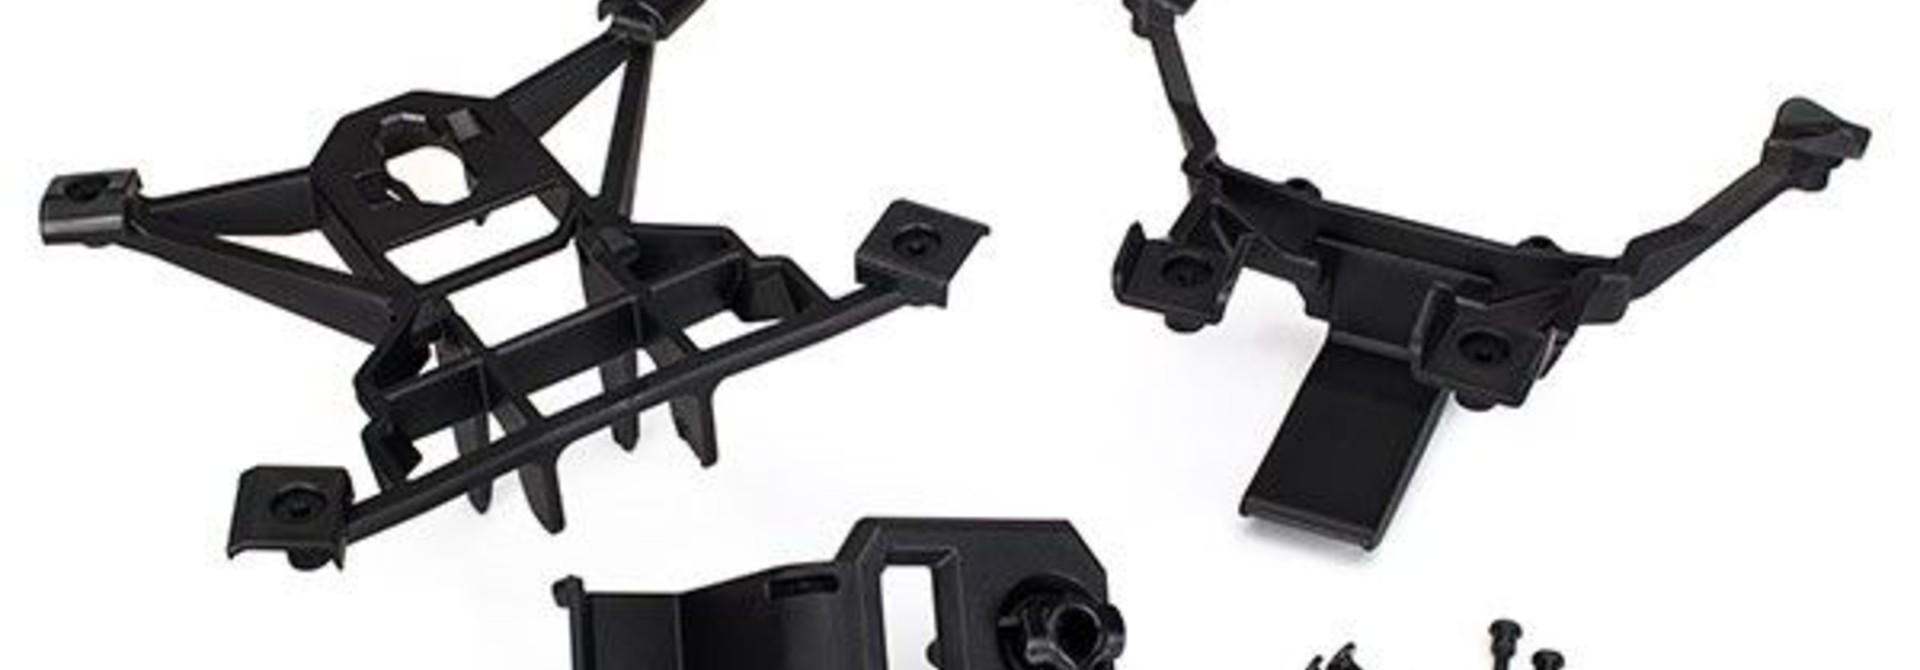 Body mounts, front & rear/ 3x15mm BCS (4)/ 3x12mm shoulder s, TRX7715